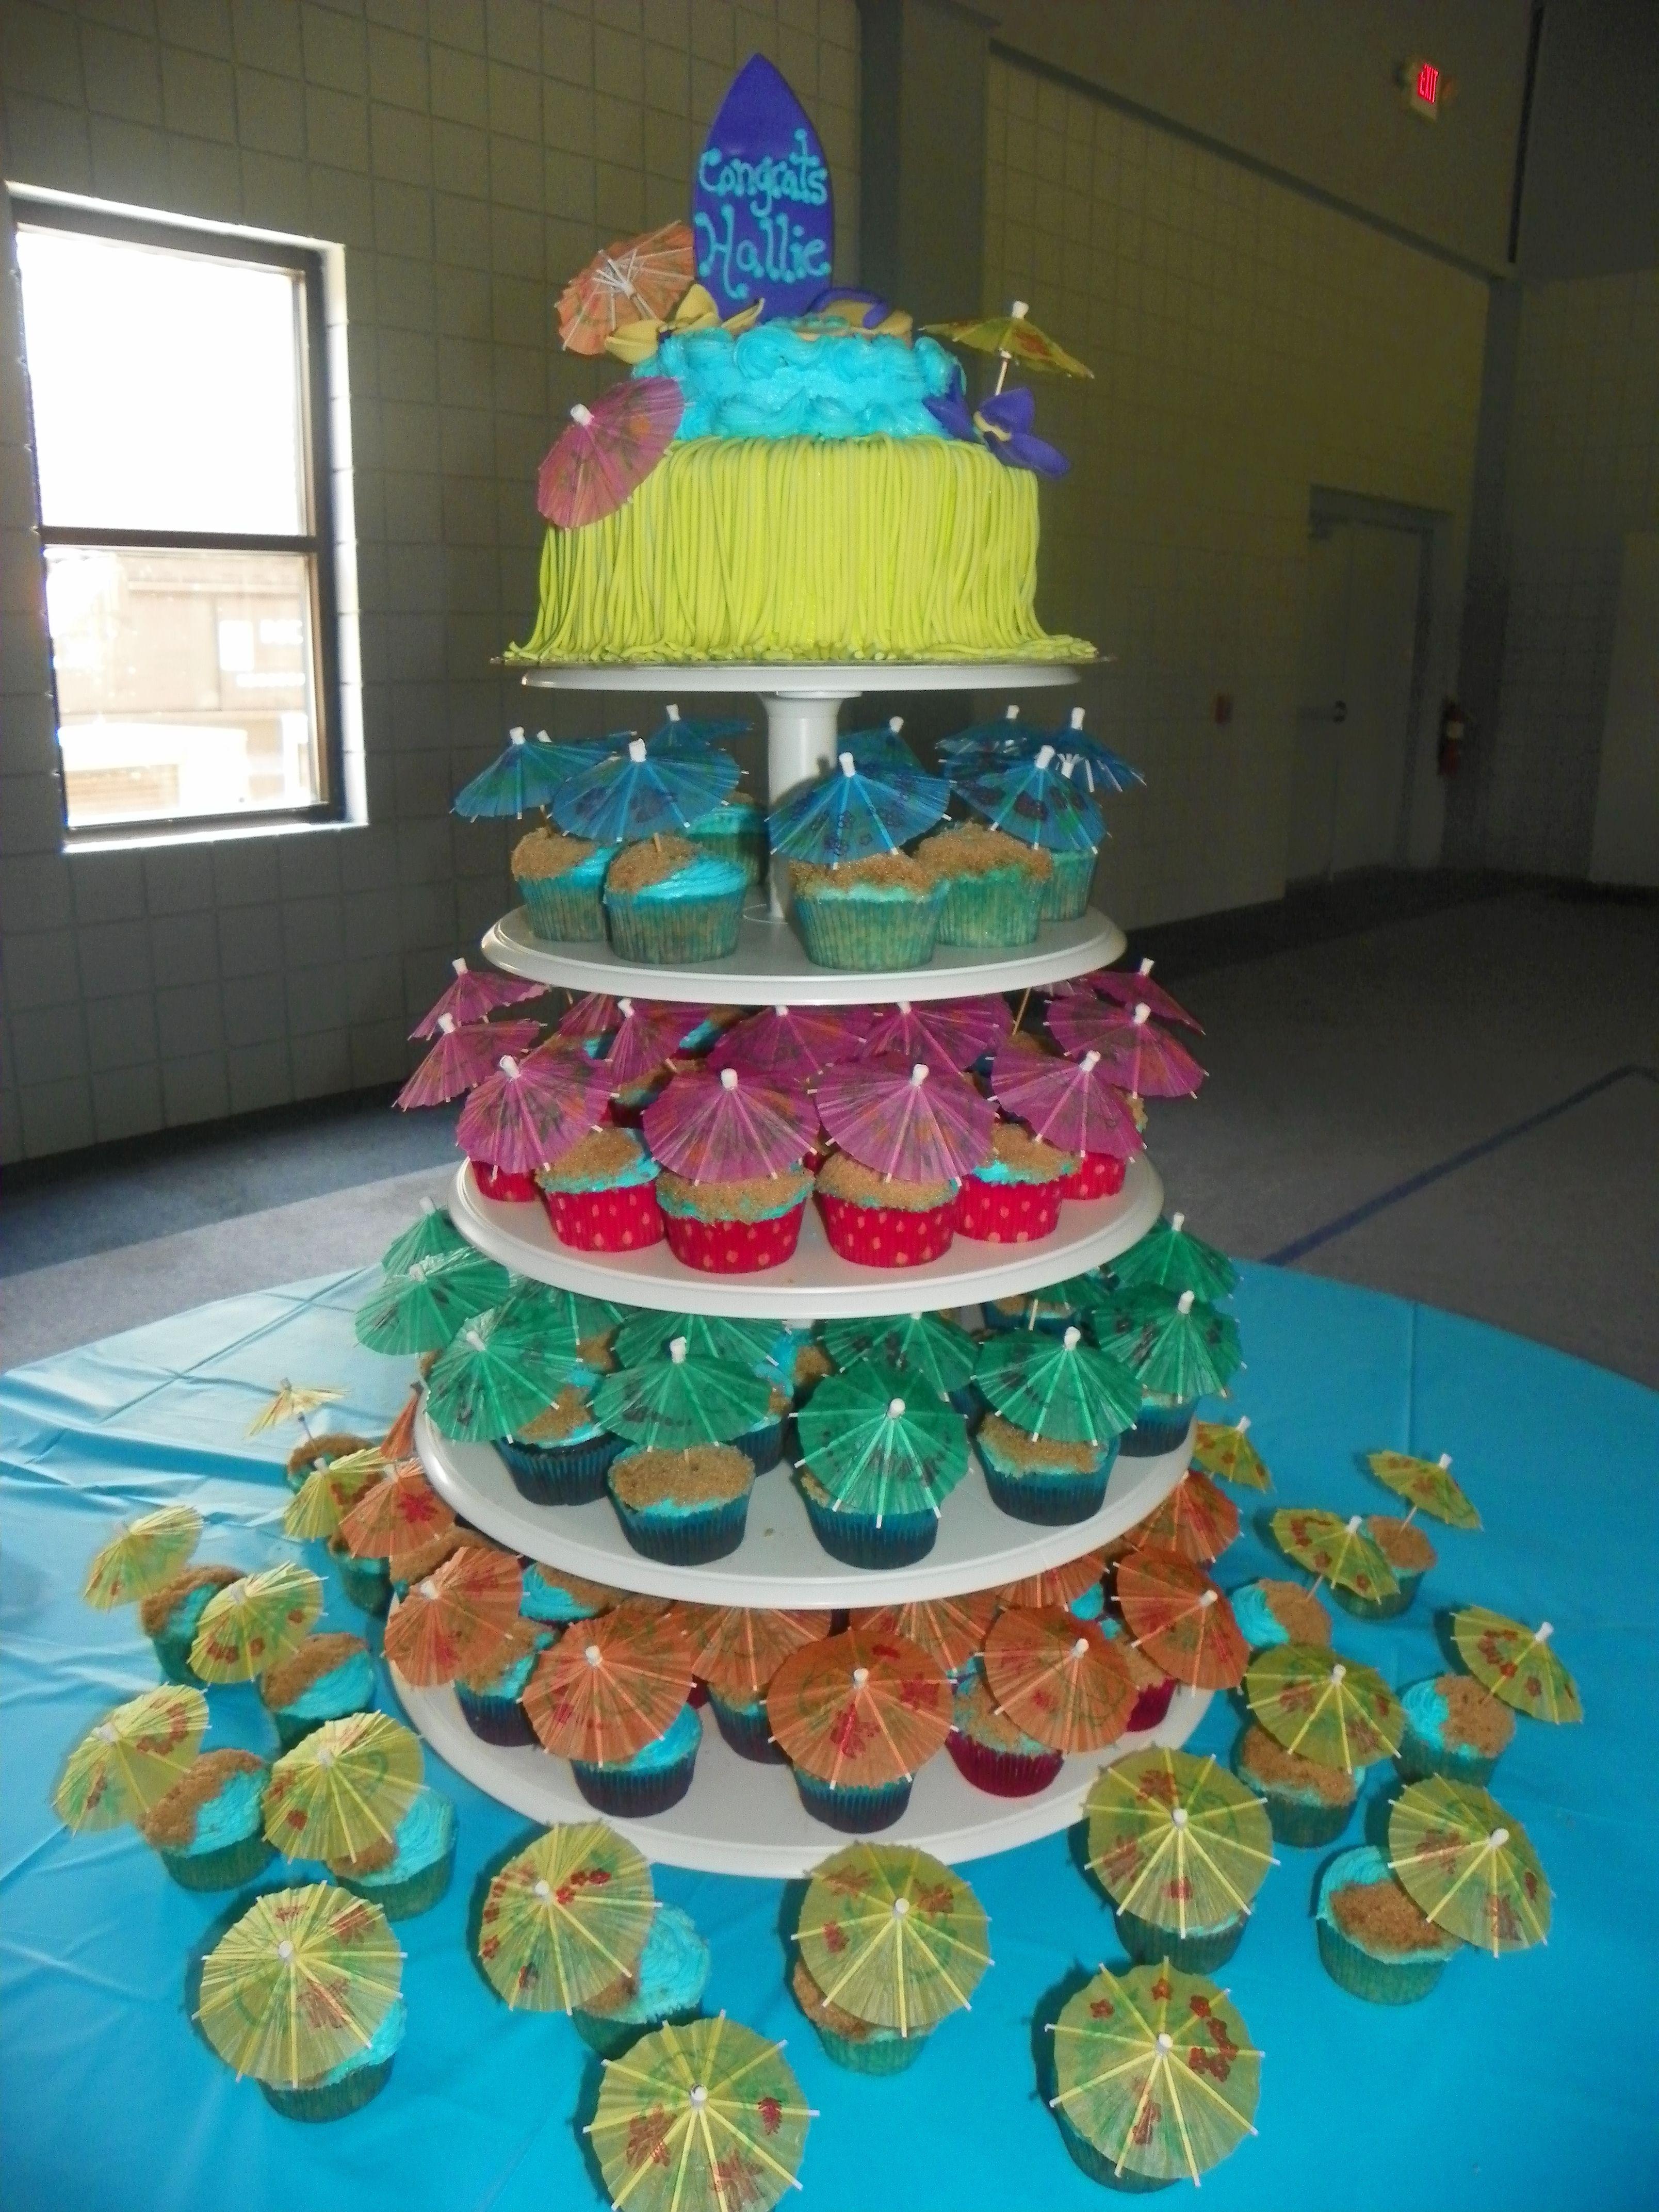 Luau Cake Cup Cakes Blue Frosting Brown Sugar Sand Umbrella